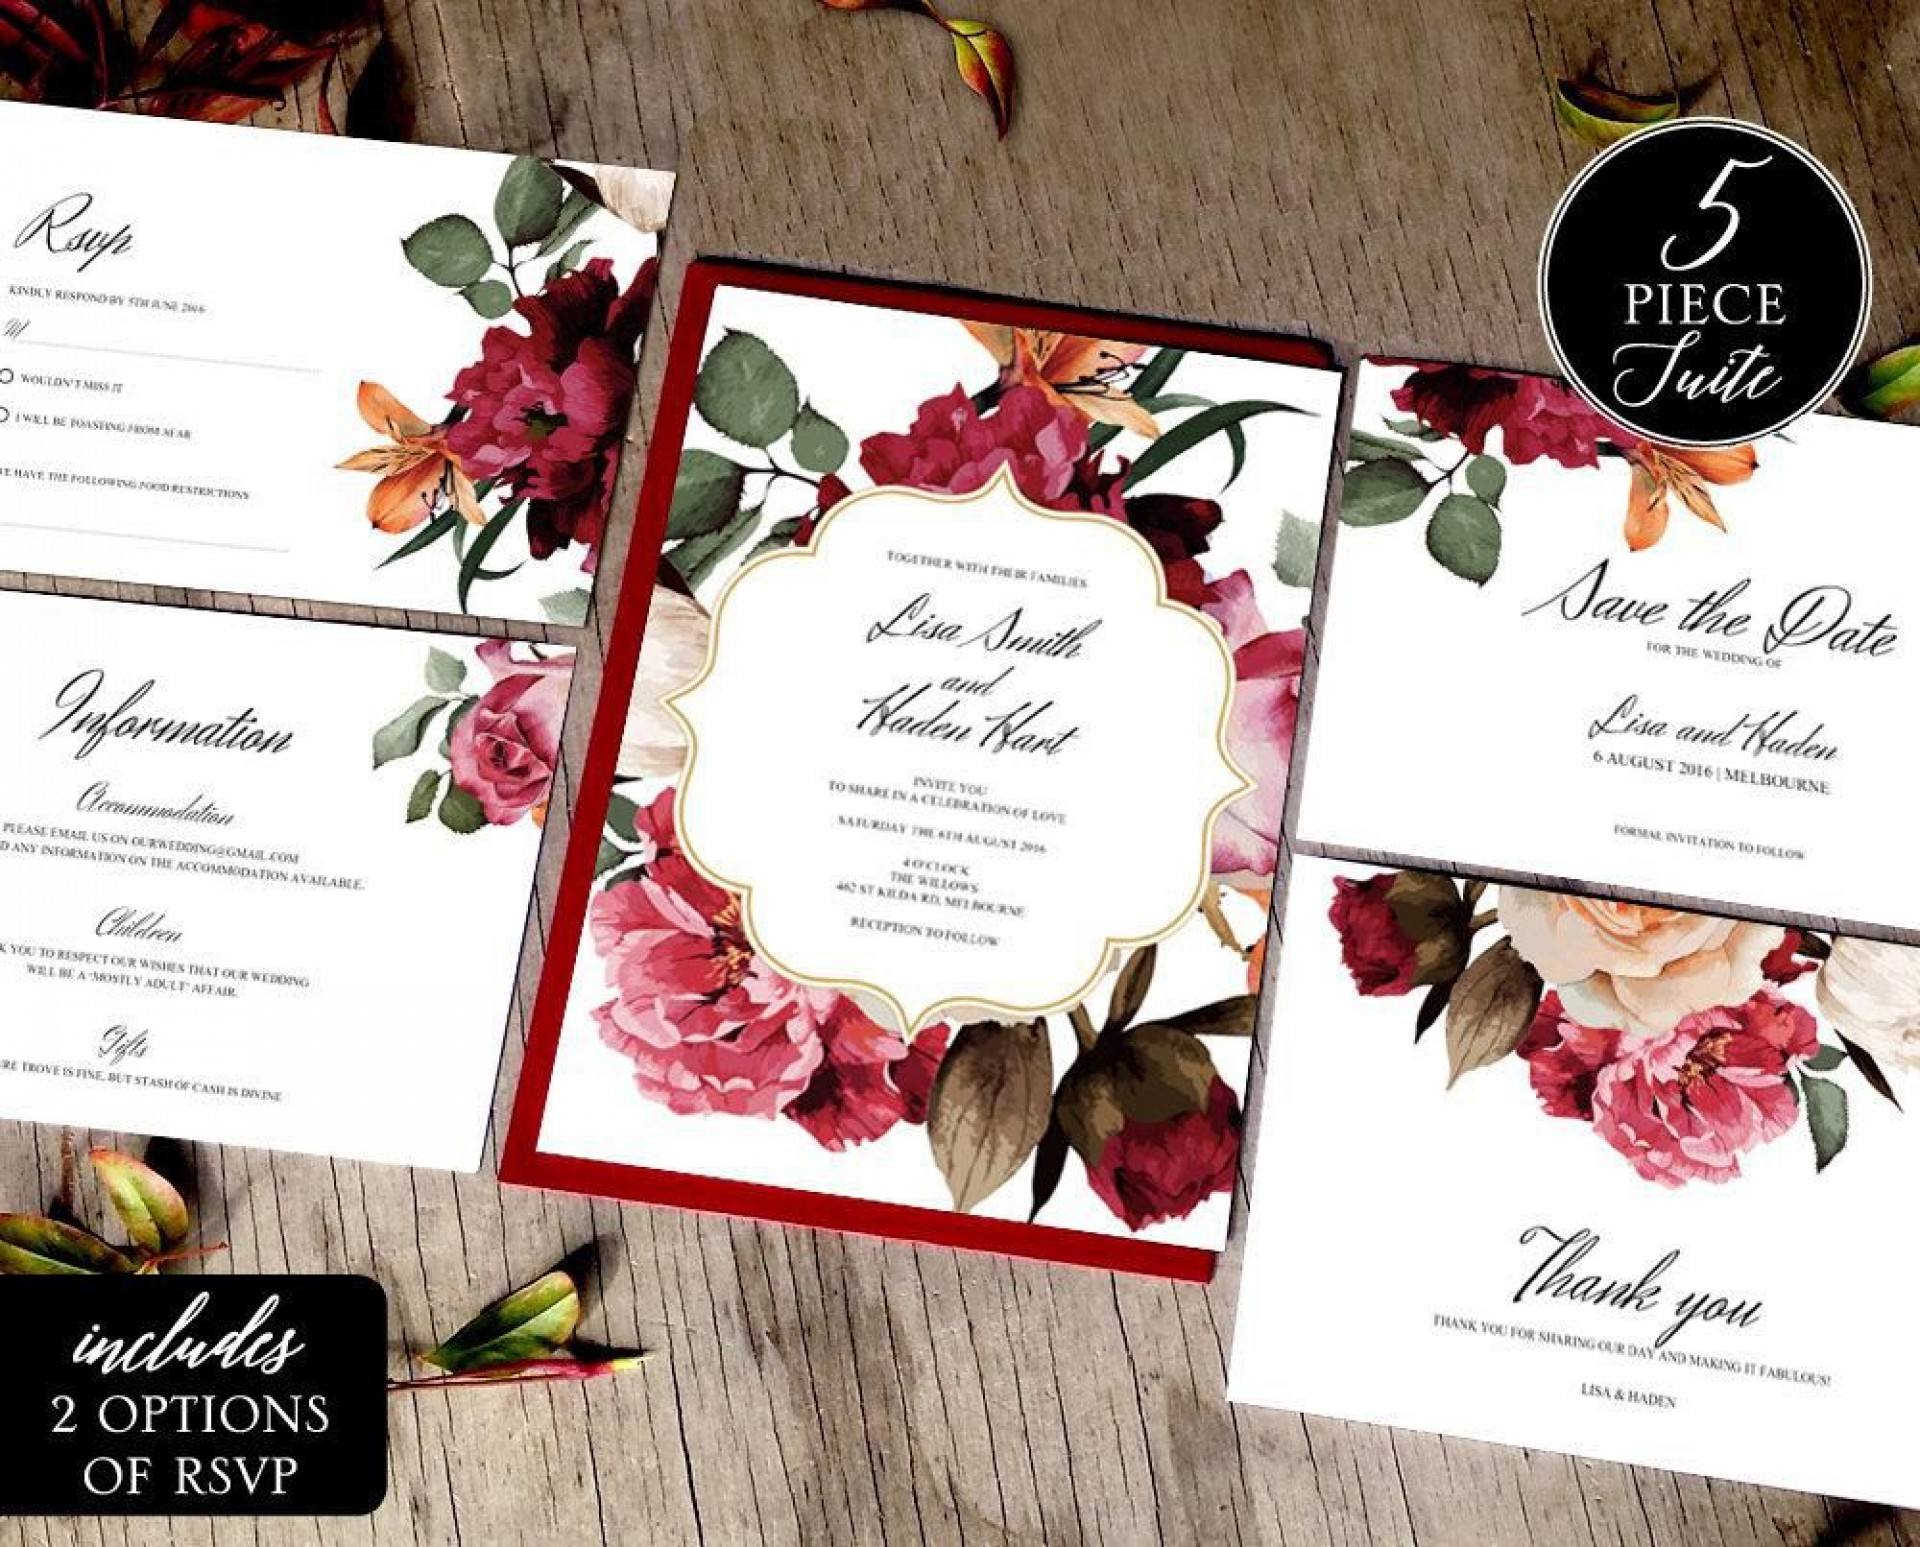 006 Imposing Sample Wedding Invitation Template Image  Templates Wording Card1920